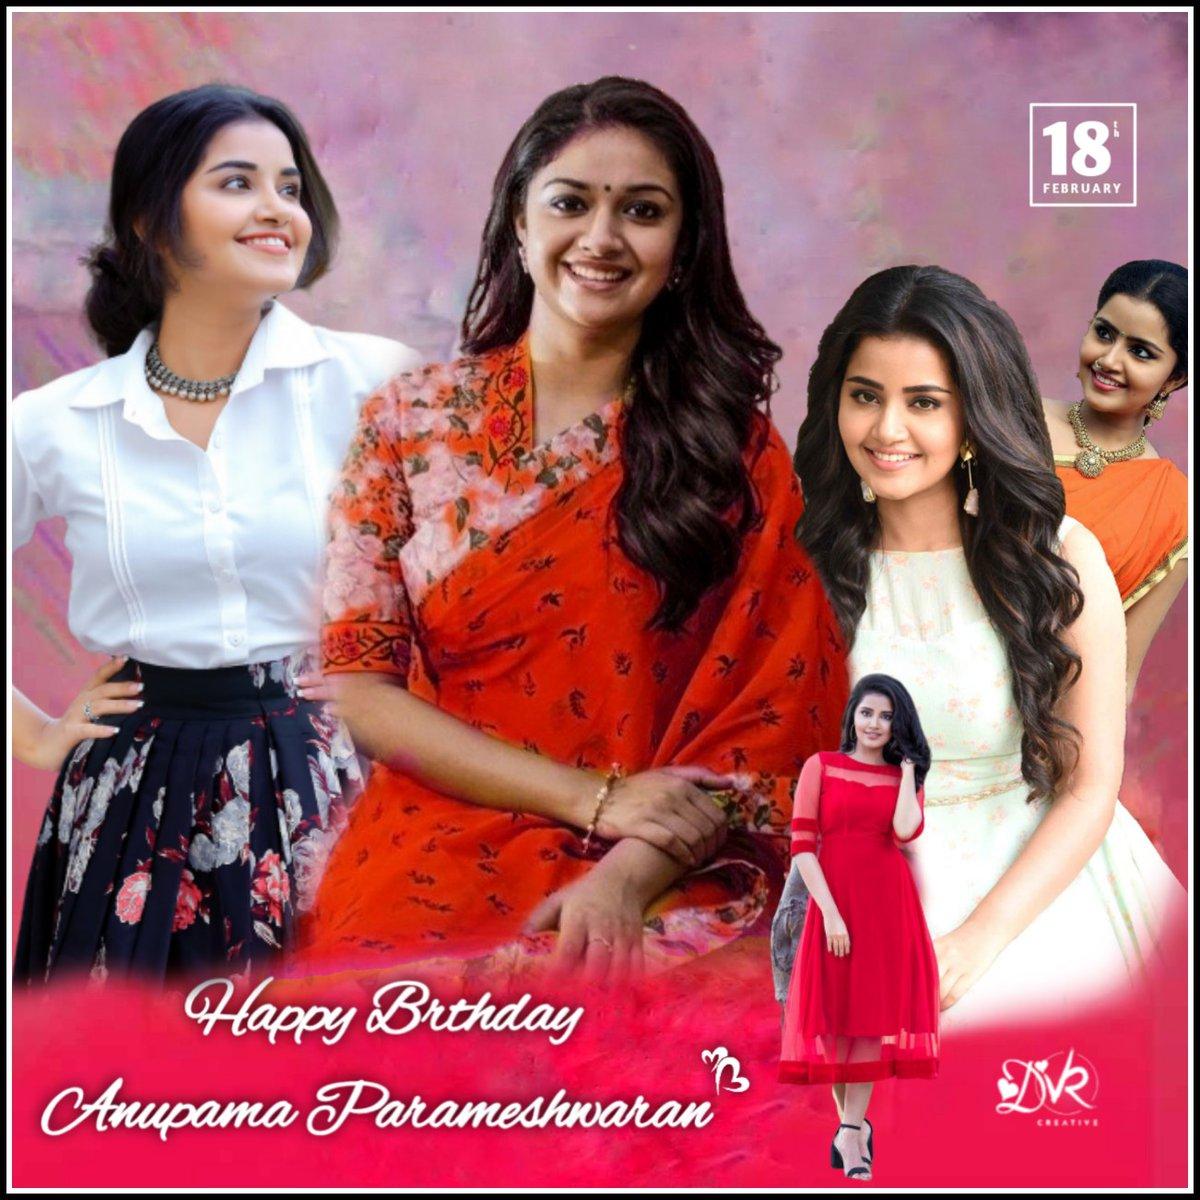 #AnupamaParameswaran birthday CDP from #keerthisuresh fans pic.twitter.com/oIGksQgMKe